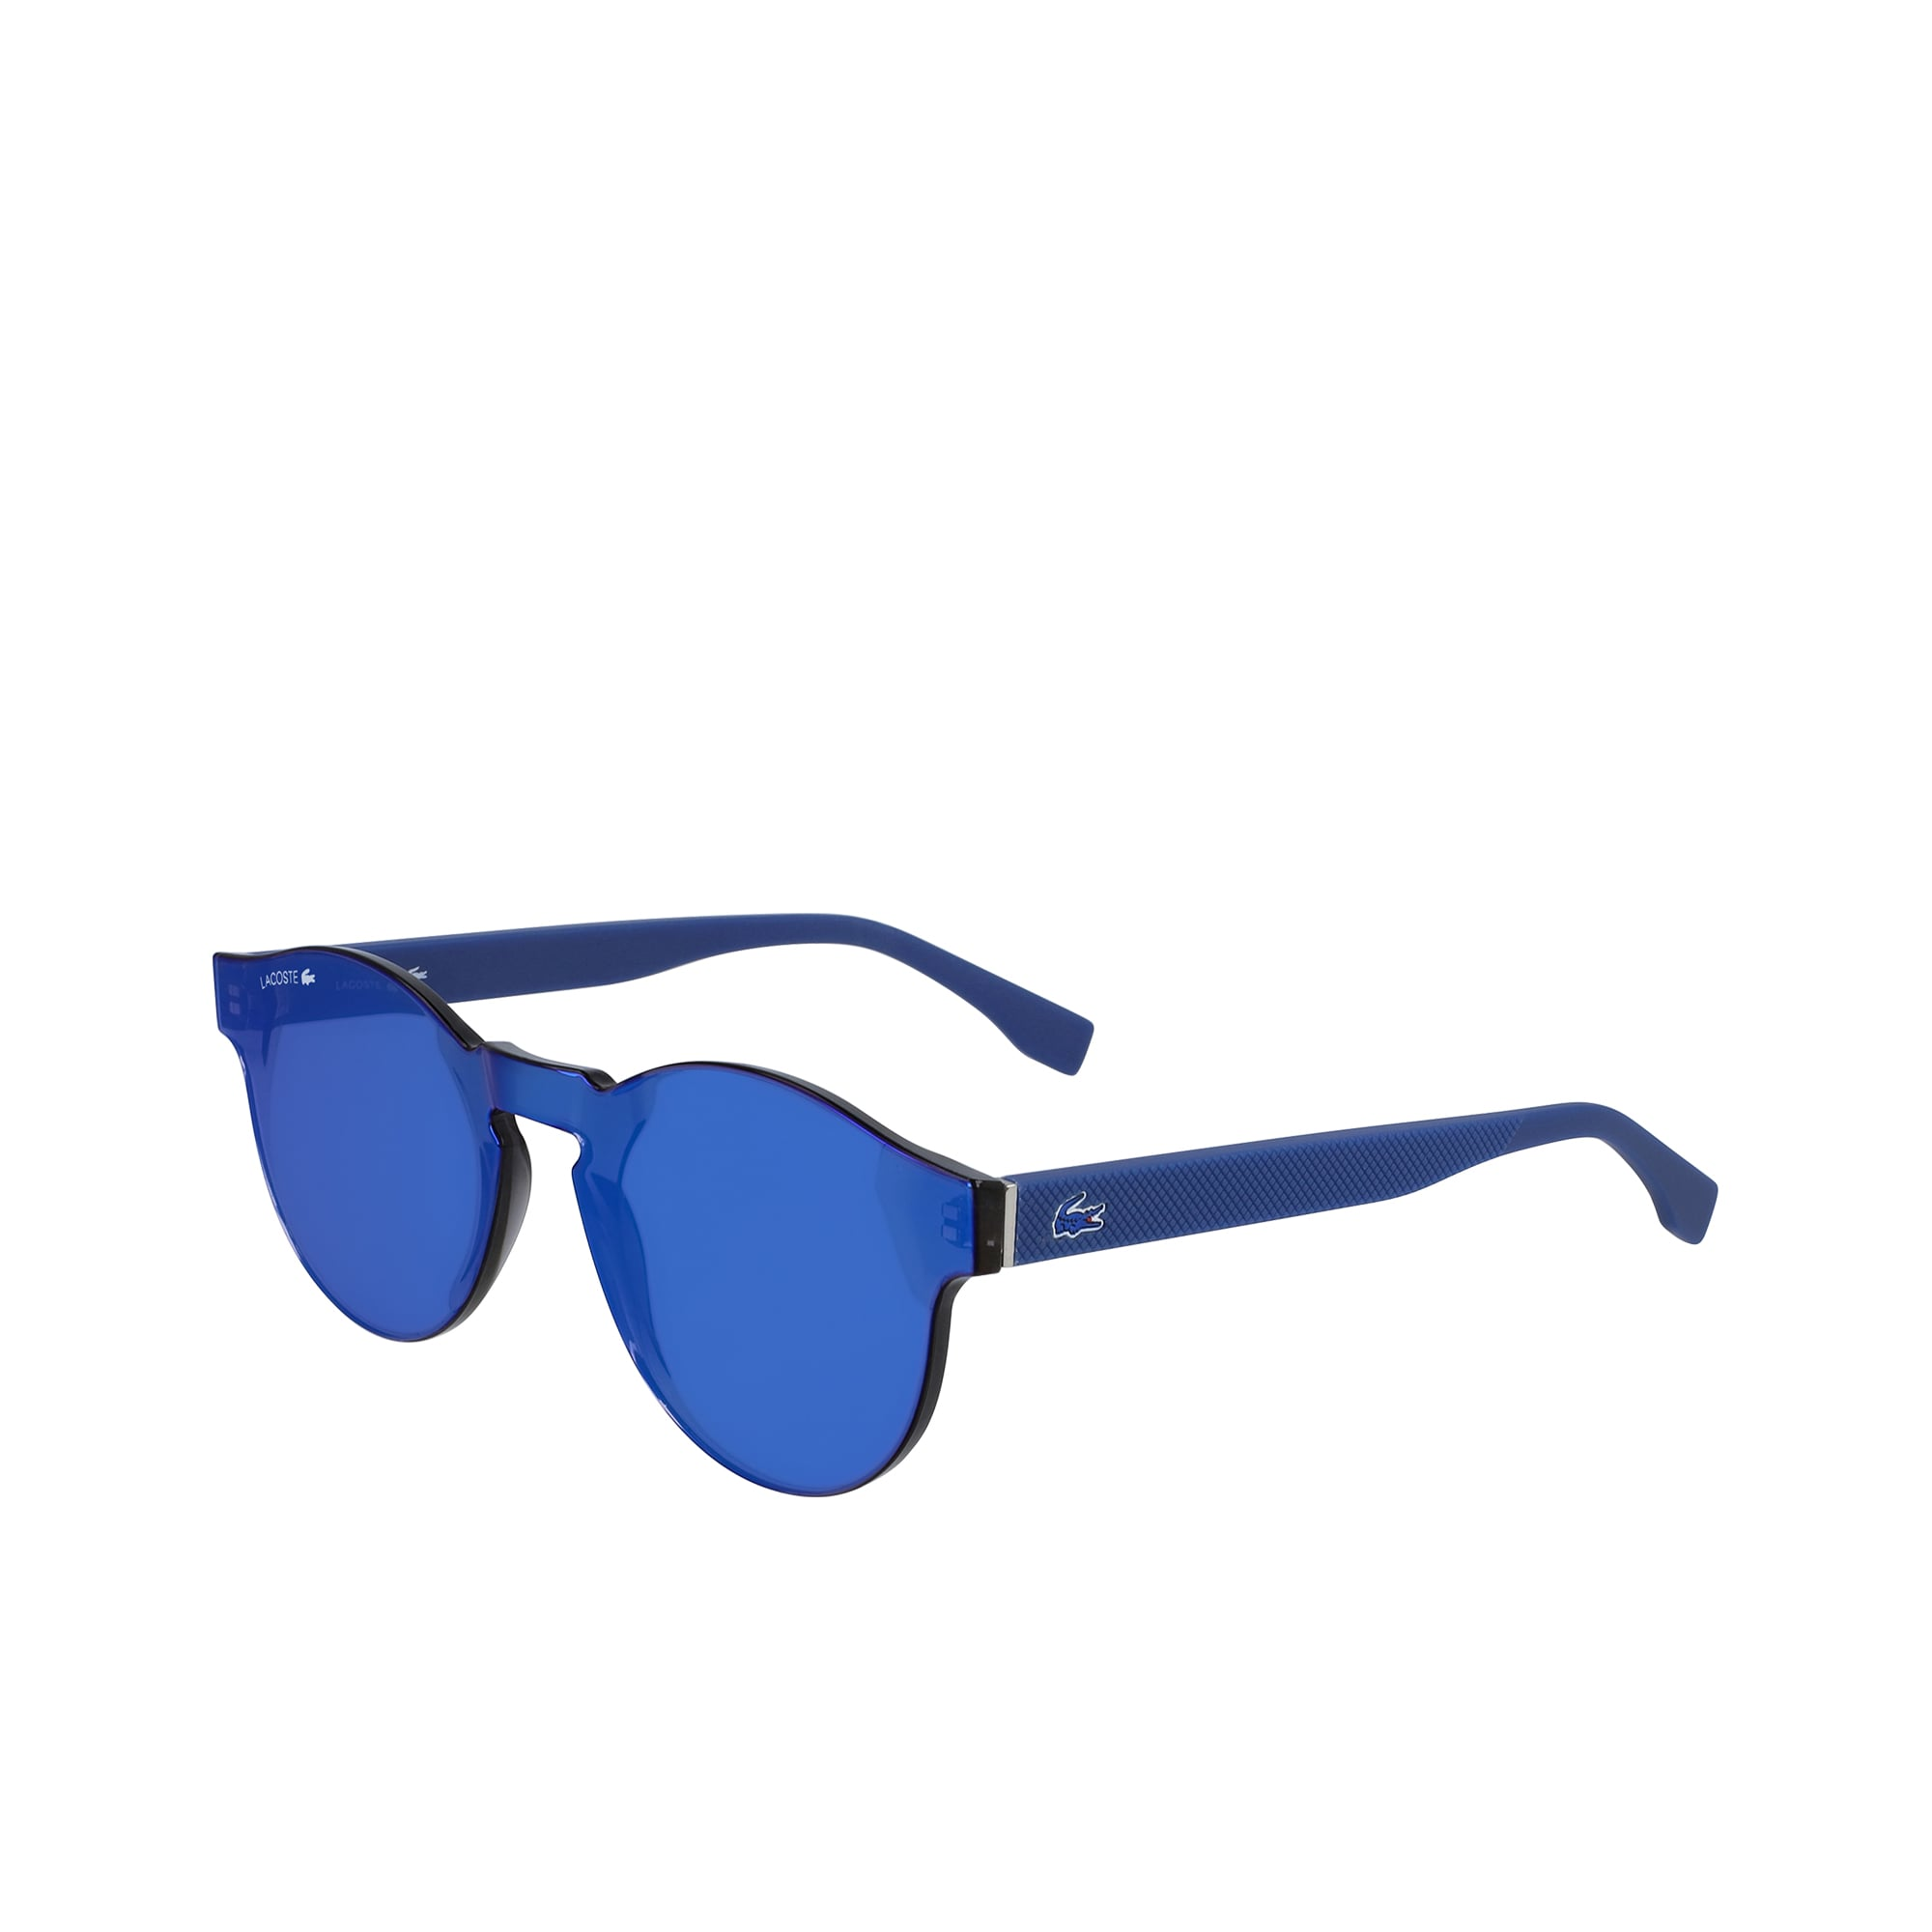 82350c83e206 Sunglasses for men